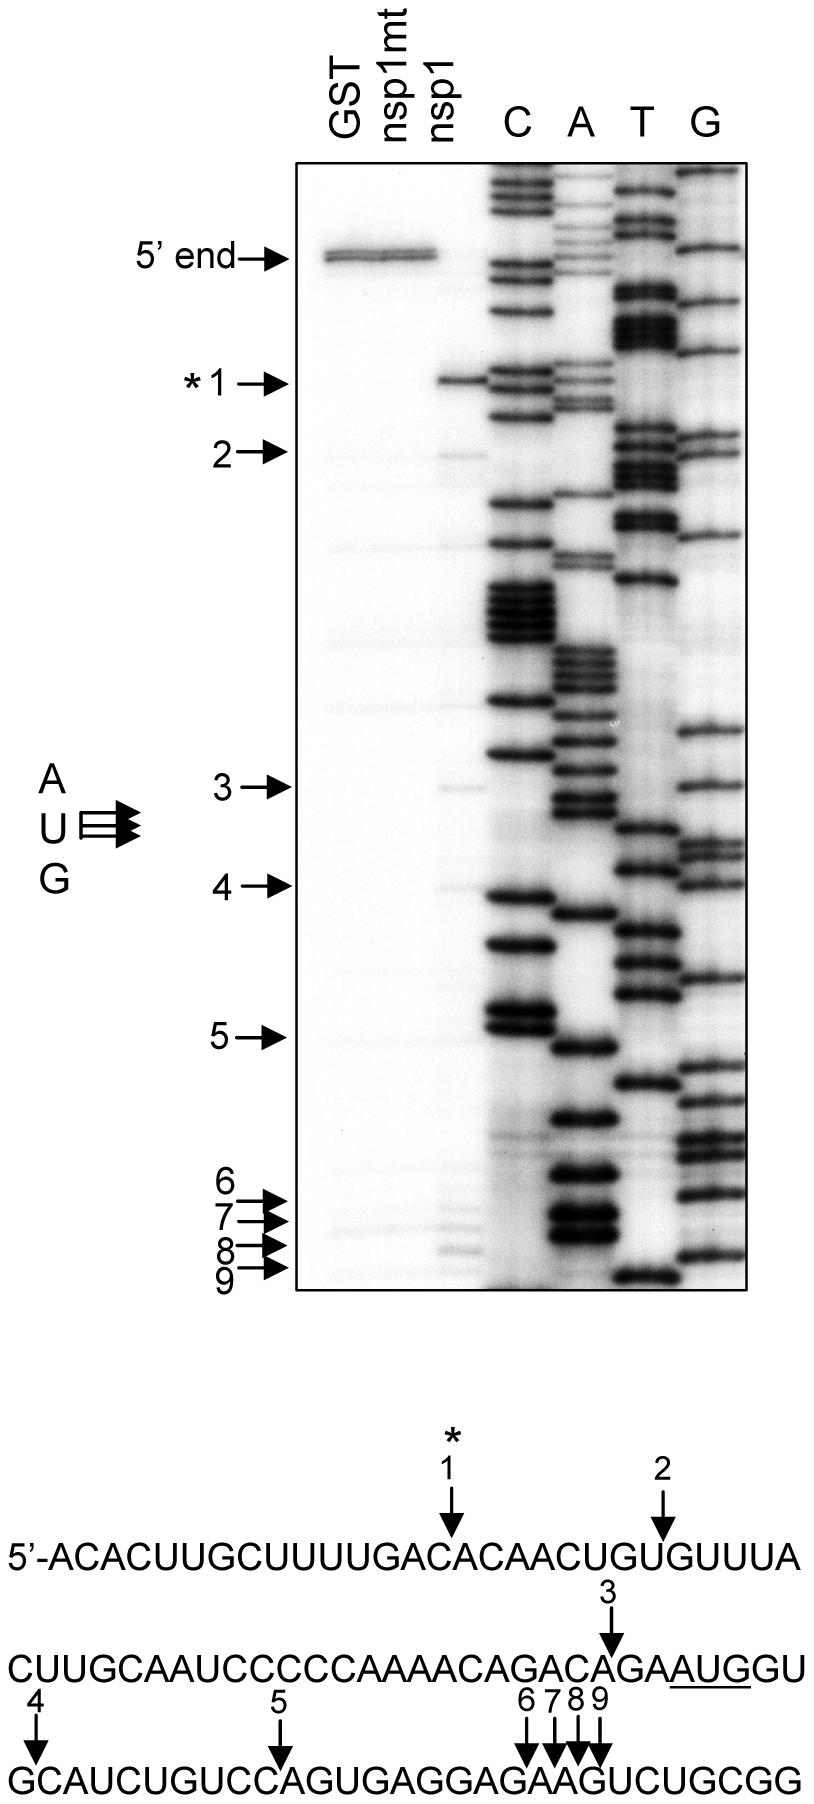 Characterization of nsp1-induced RNA modification in rabbit β-globin mRNA.